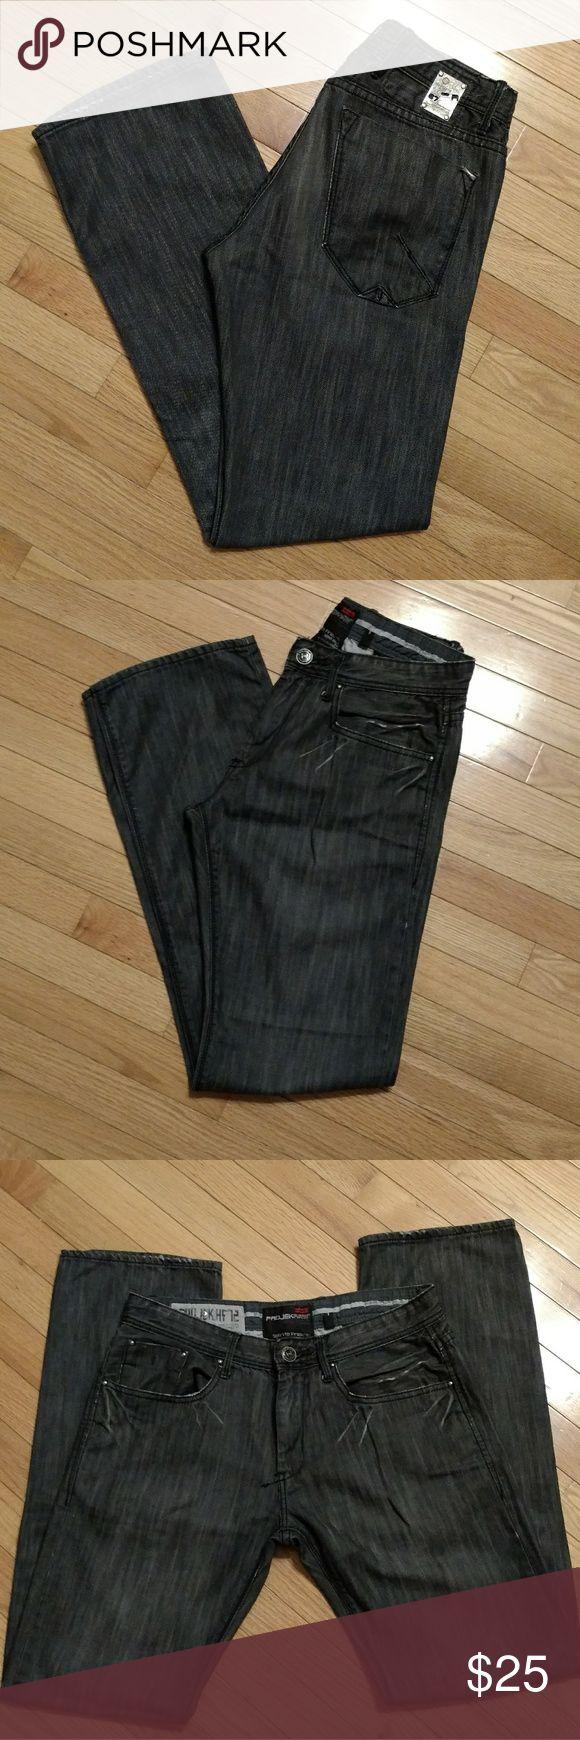 Projek Raw Men's Jeans Men's Jeans From Buckle's Projek Raw line. Black wash. Size 32. Excellent used condition. Projek Raw Jeans